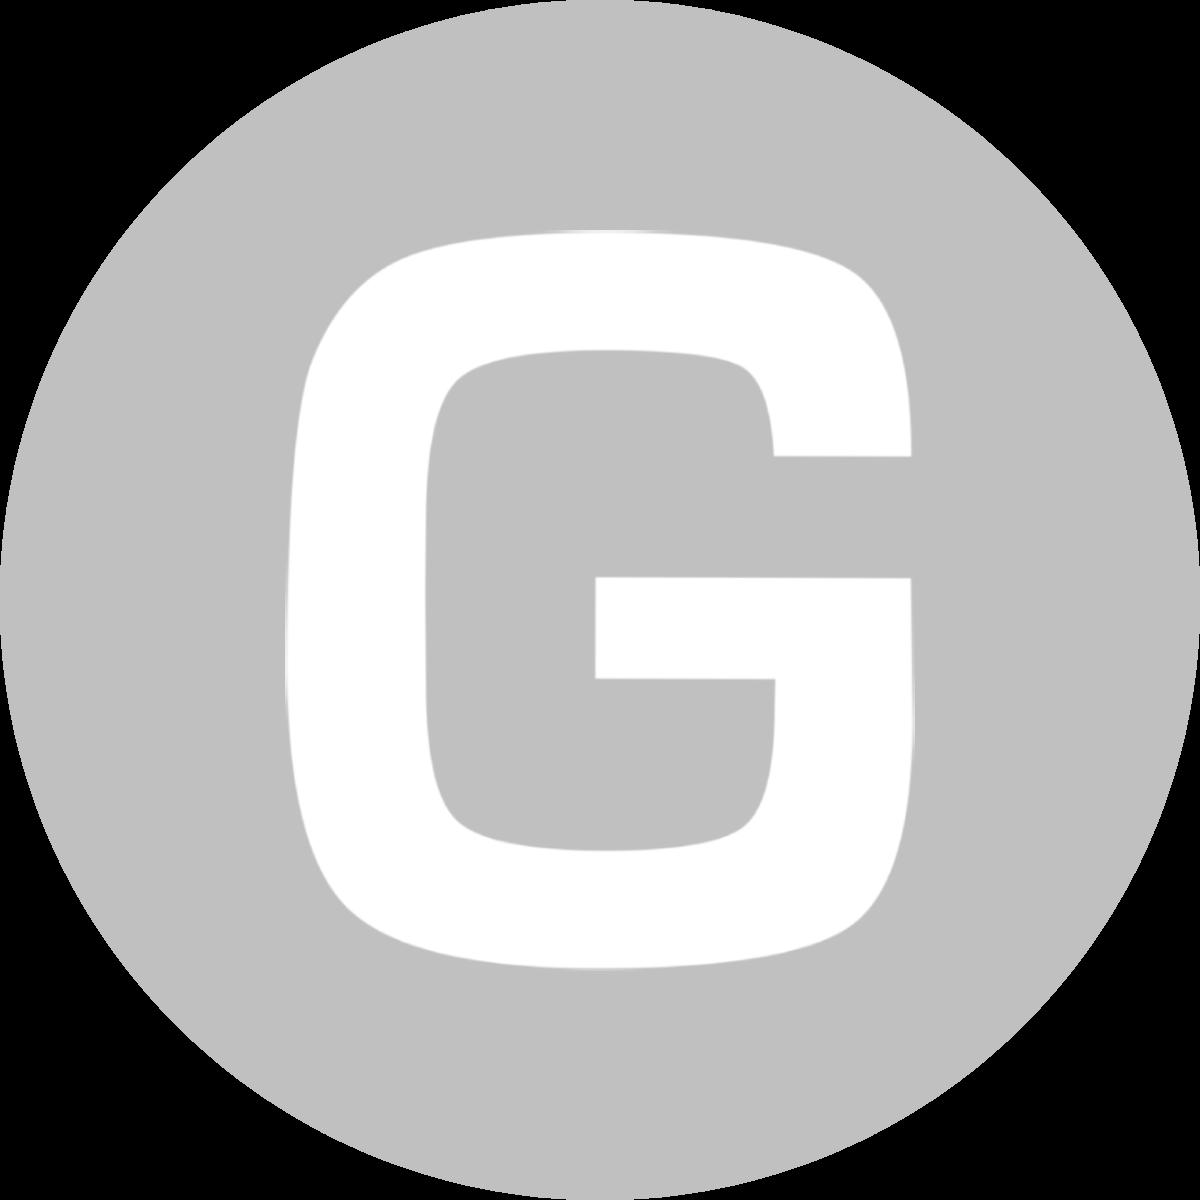 TaylorMade Tour Response Hvit 3 dusin / 36 baller